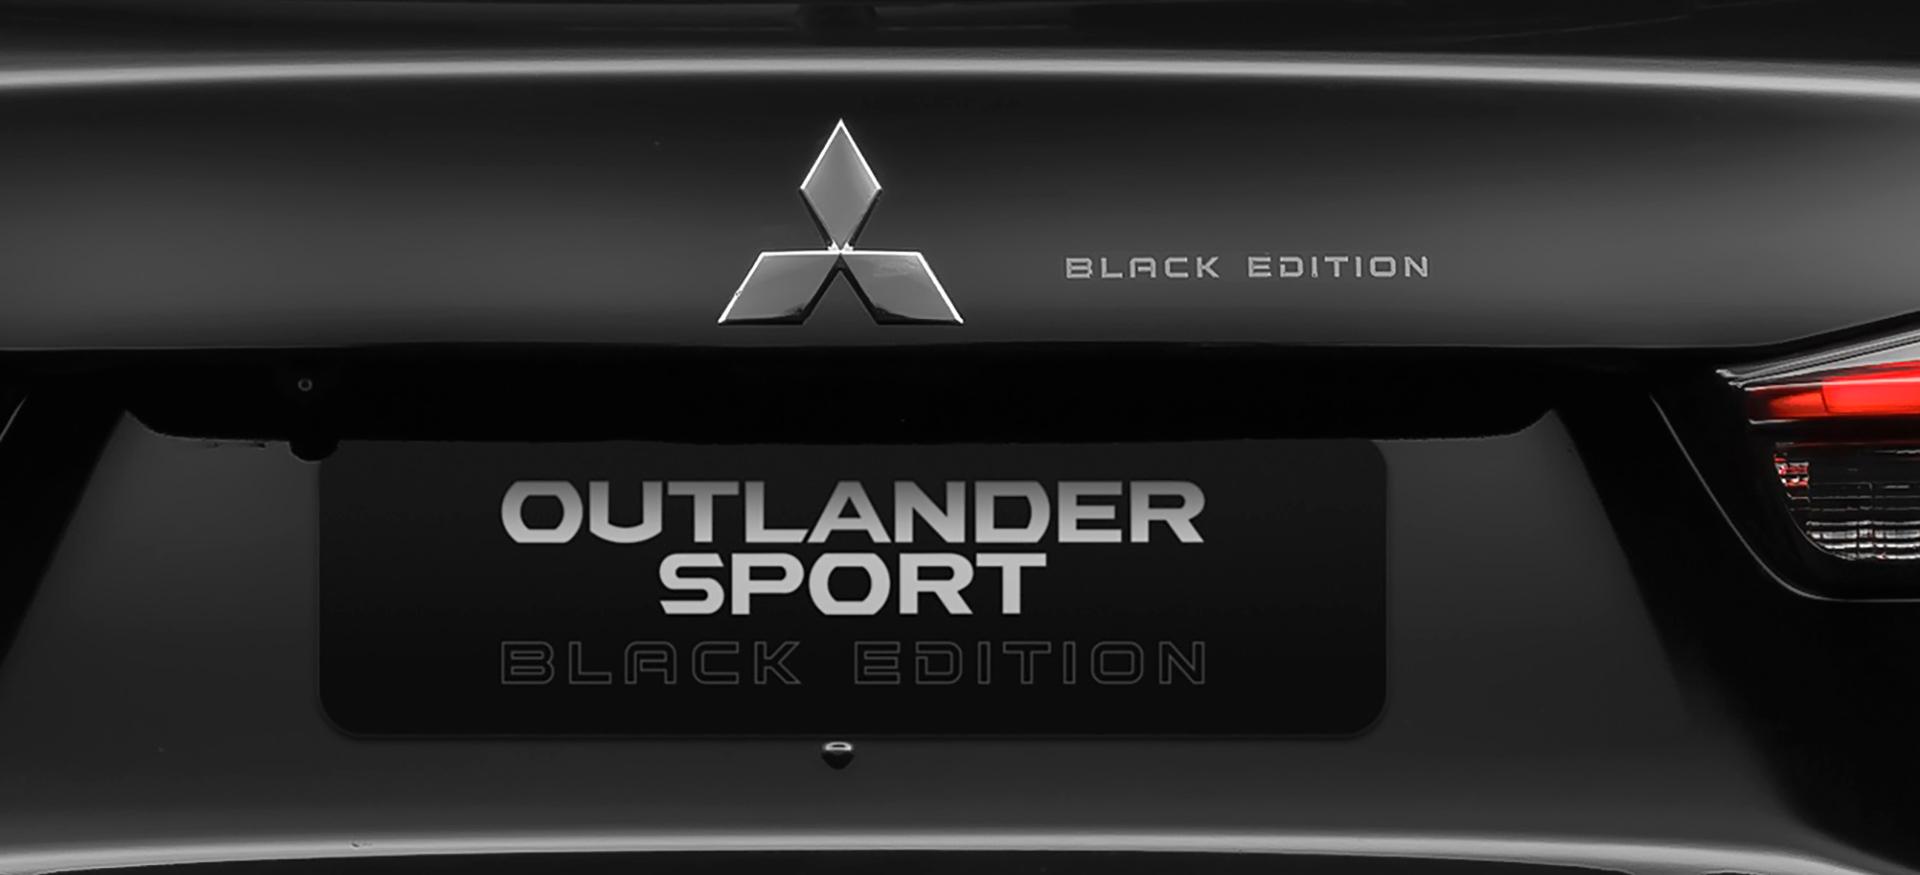 Outlander Sport Black Edition